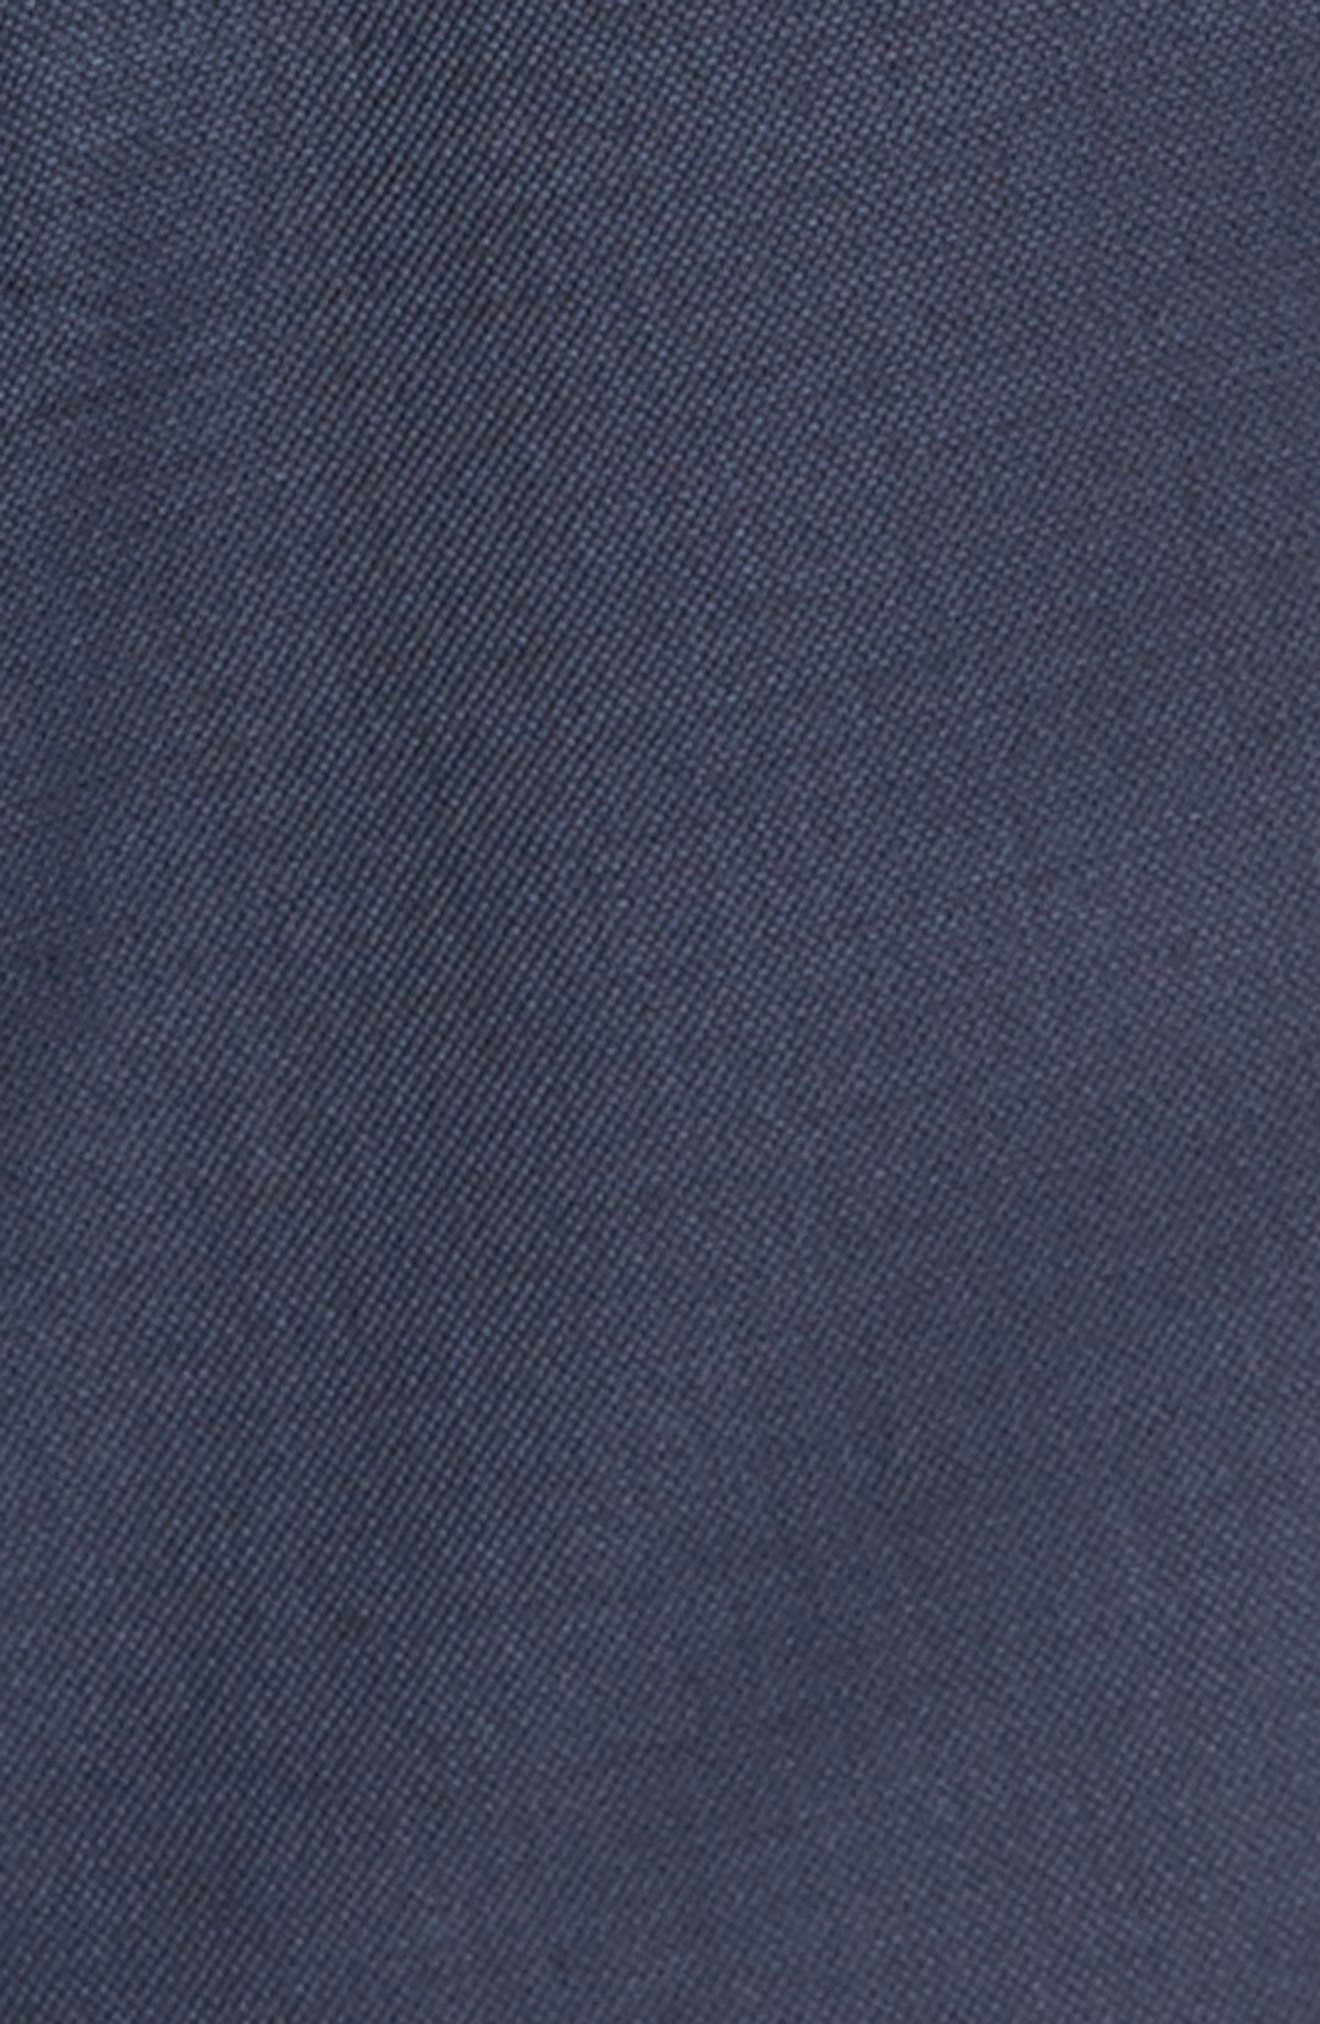 Classic Fit Sharkskin Wool Suit,                             Alternate thumbnail 7, color,                             410